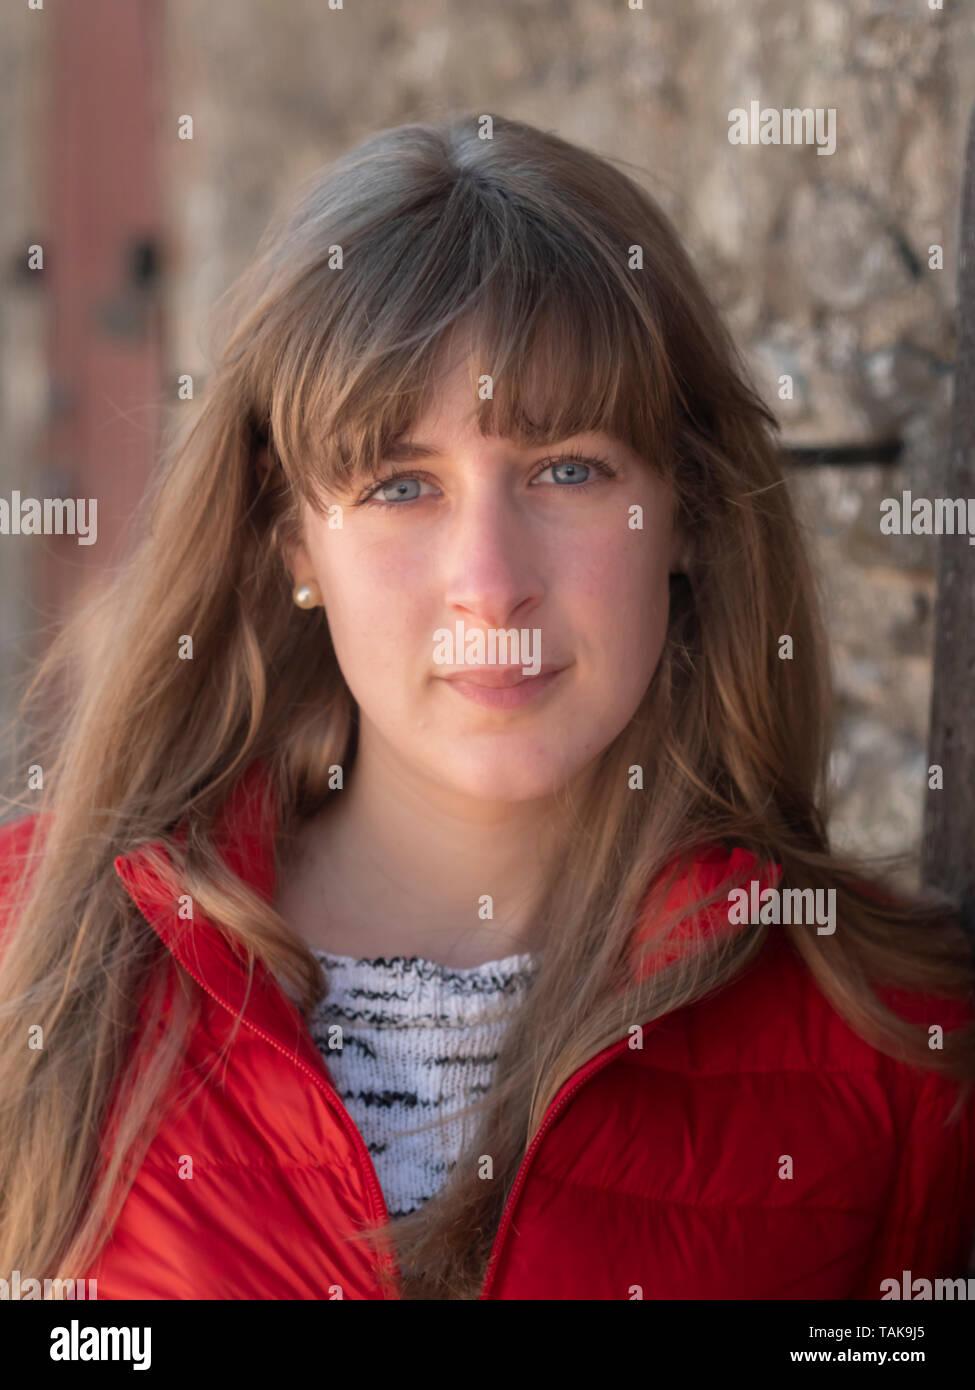 25-jährige Dame datiert Dating online spanisch